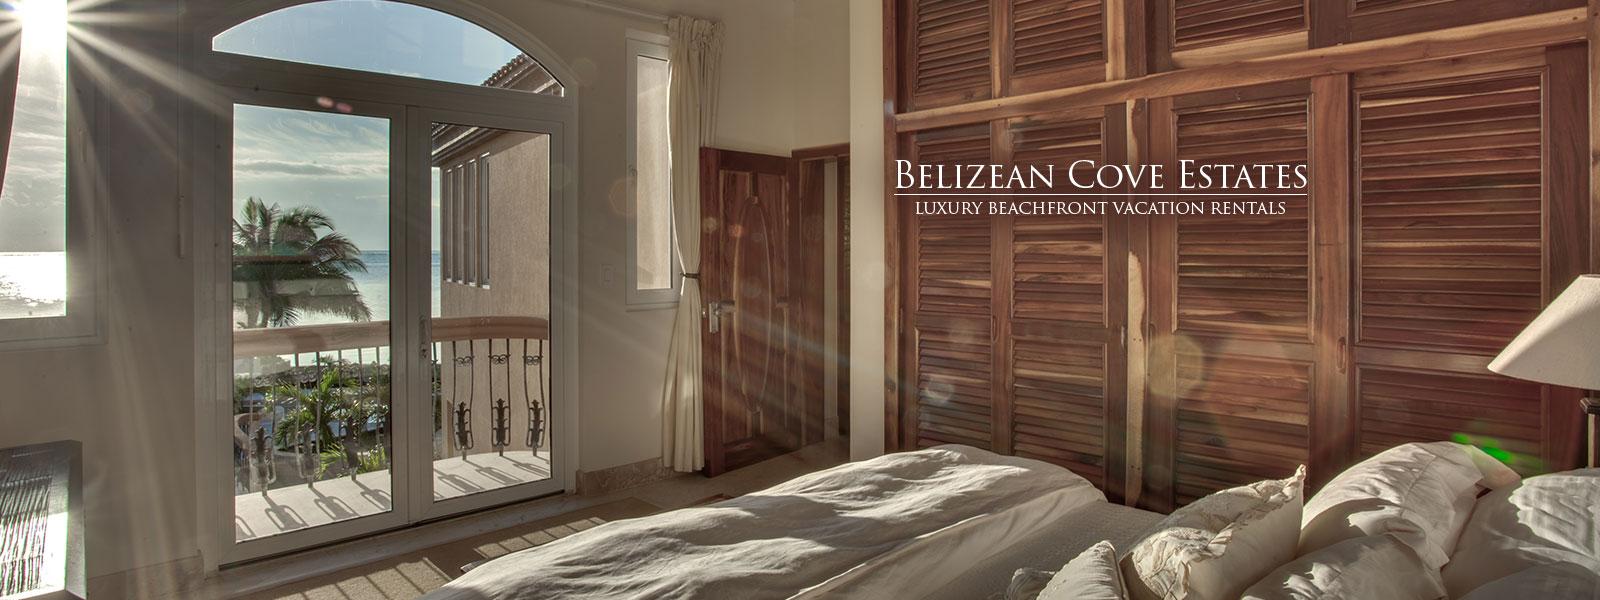 Beautiful beachfront sunrise in Belize at Sandy Point Resorts